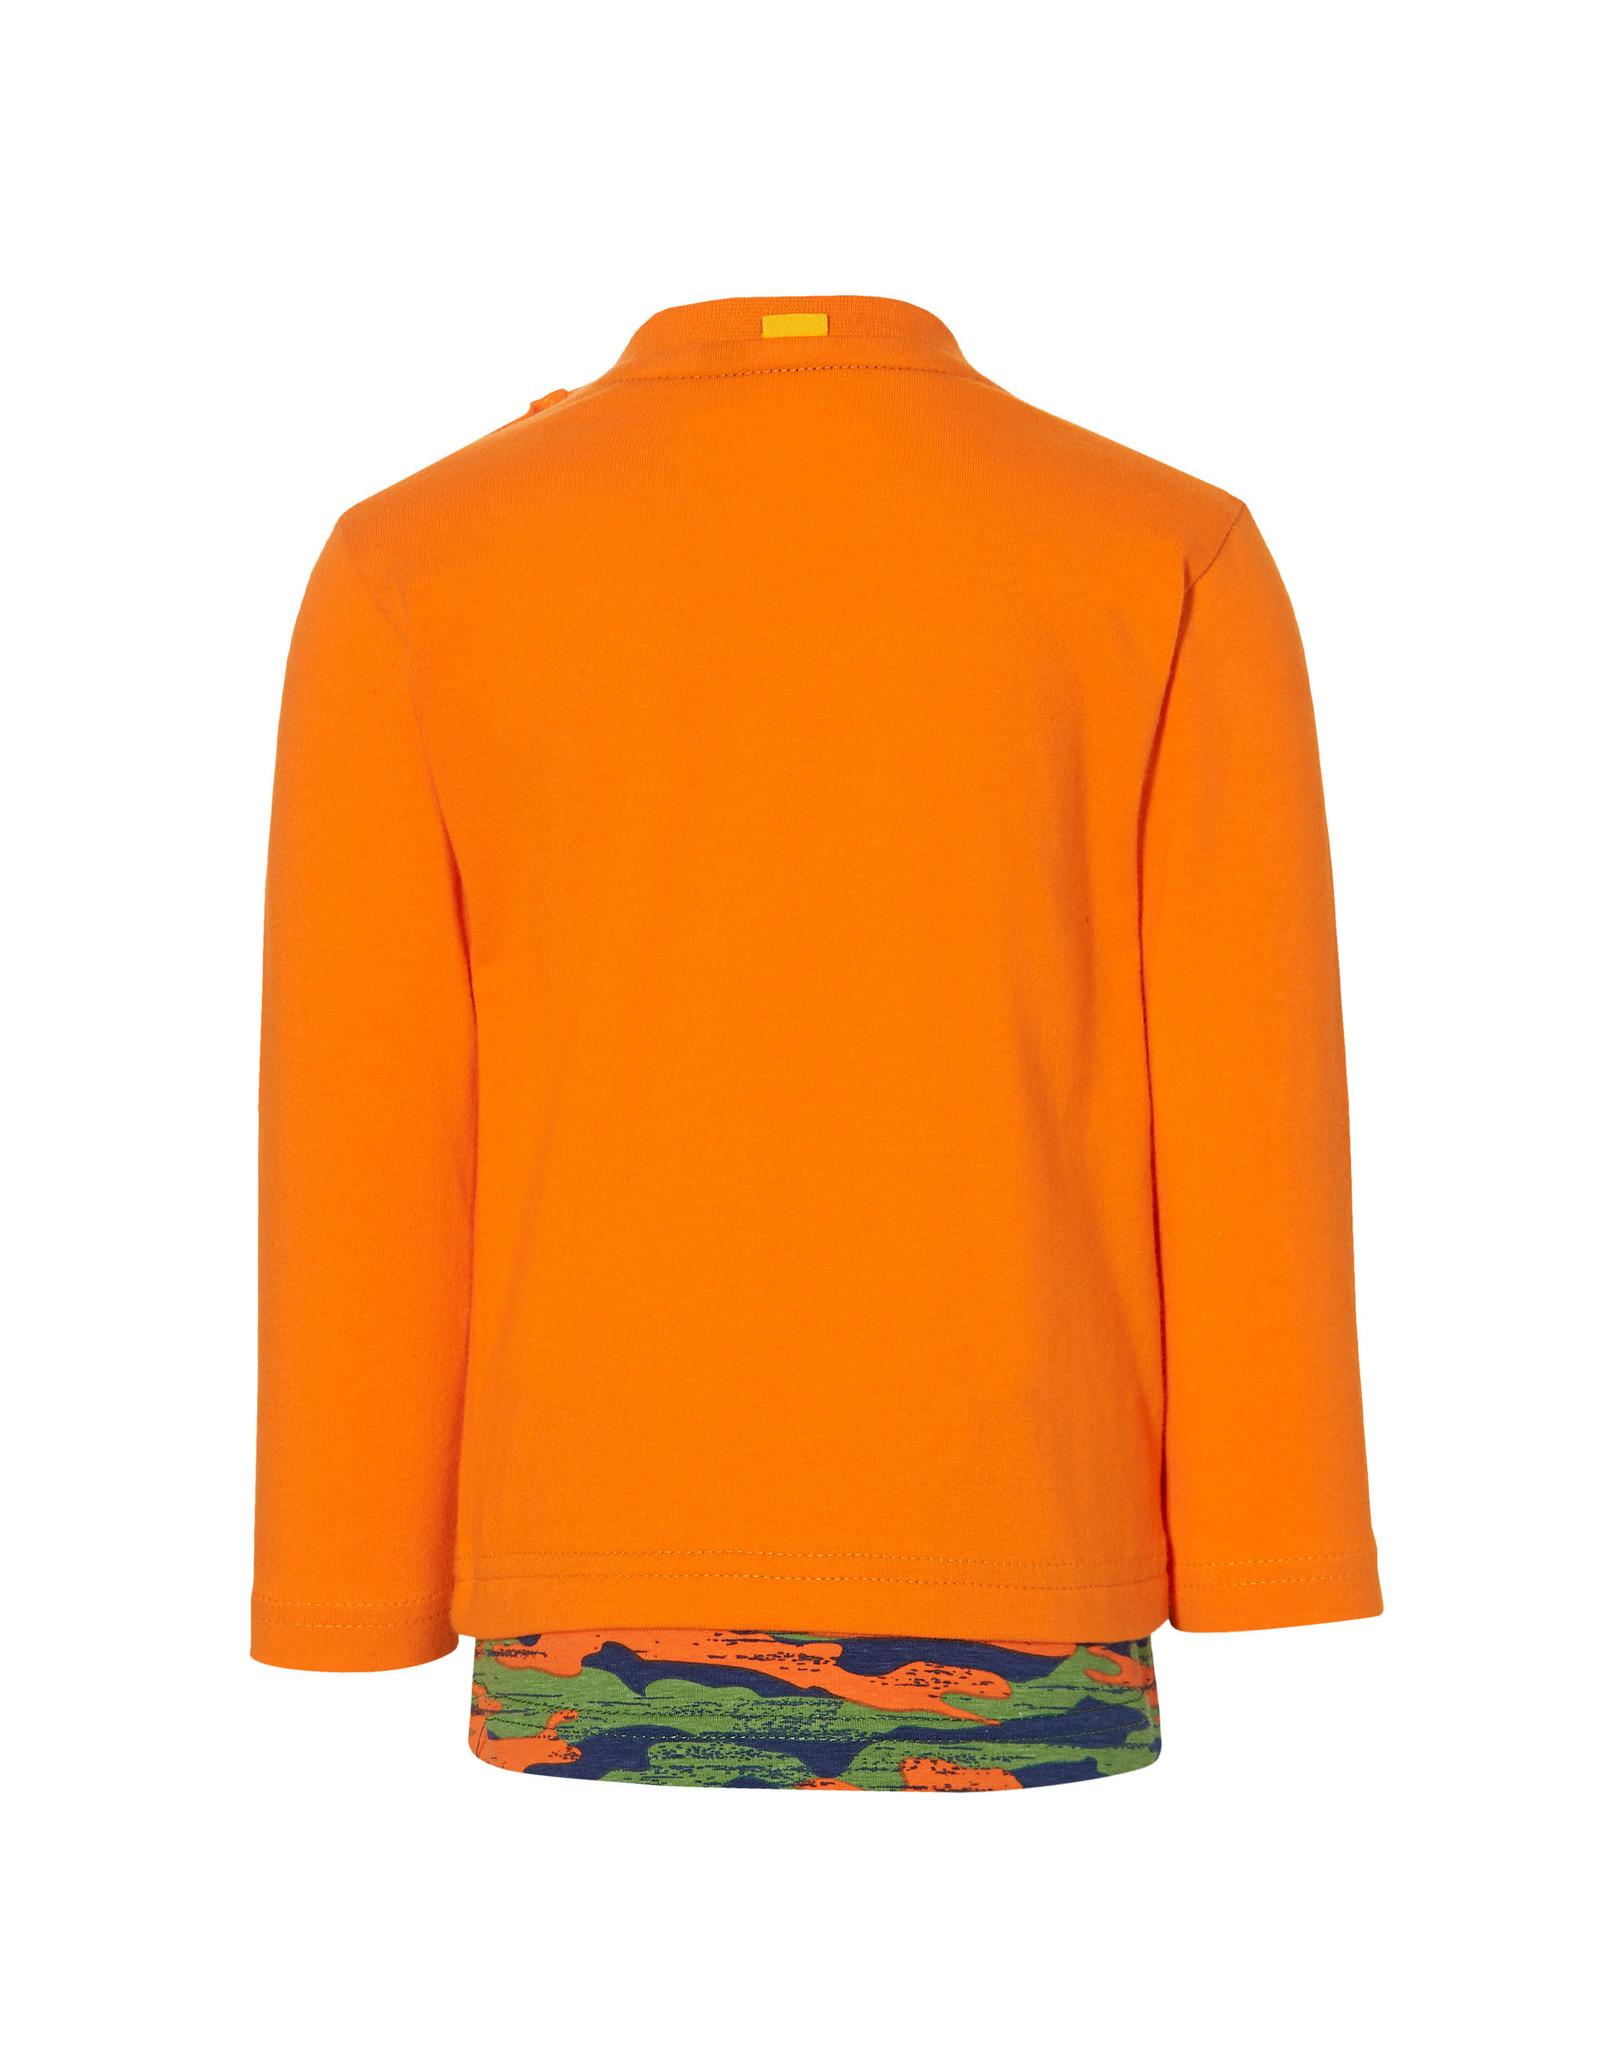 Quapi Quapi baby jongens shirt Epke Tiger Orange